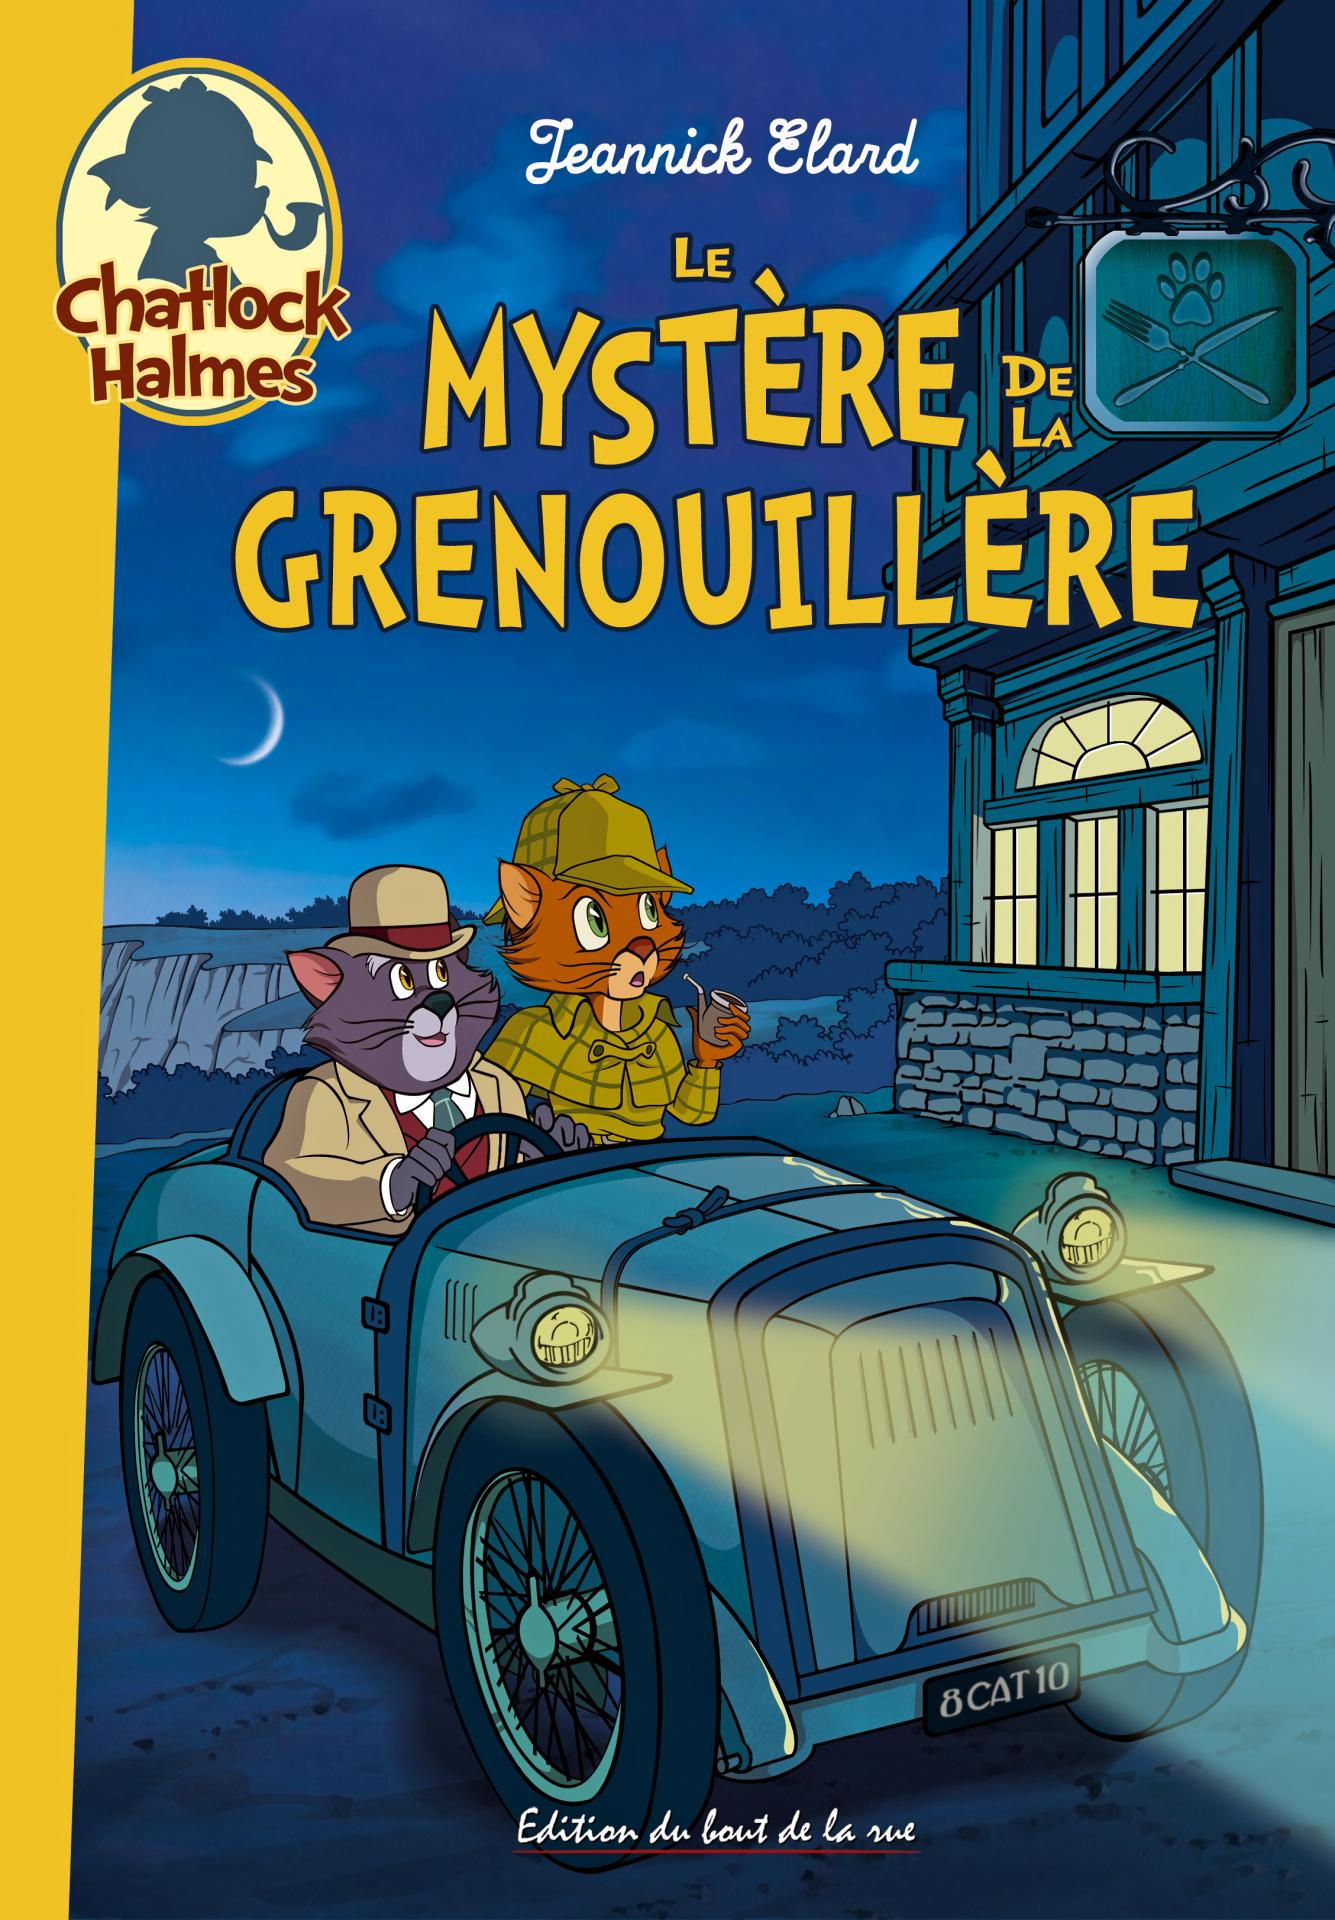 Mystere grenouillere